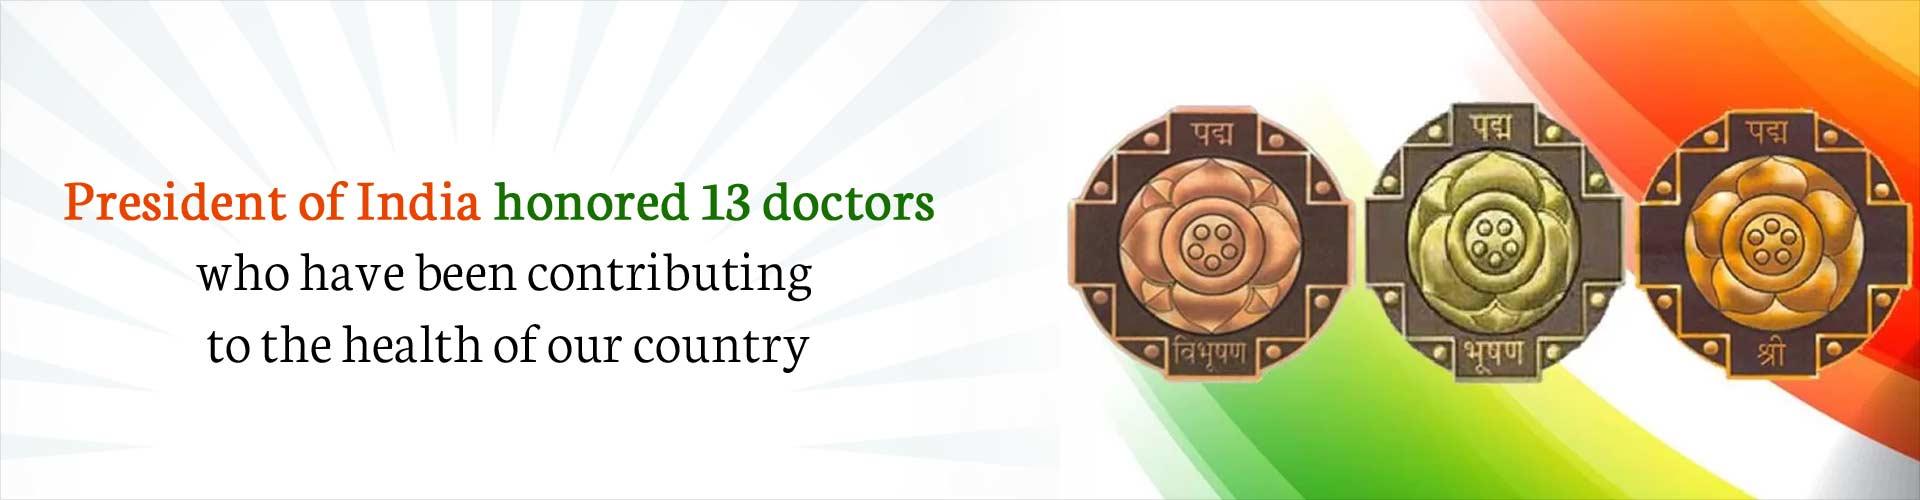 Padma Awards 2020: President Honors 13 Unsung Heroes of Medicine